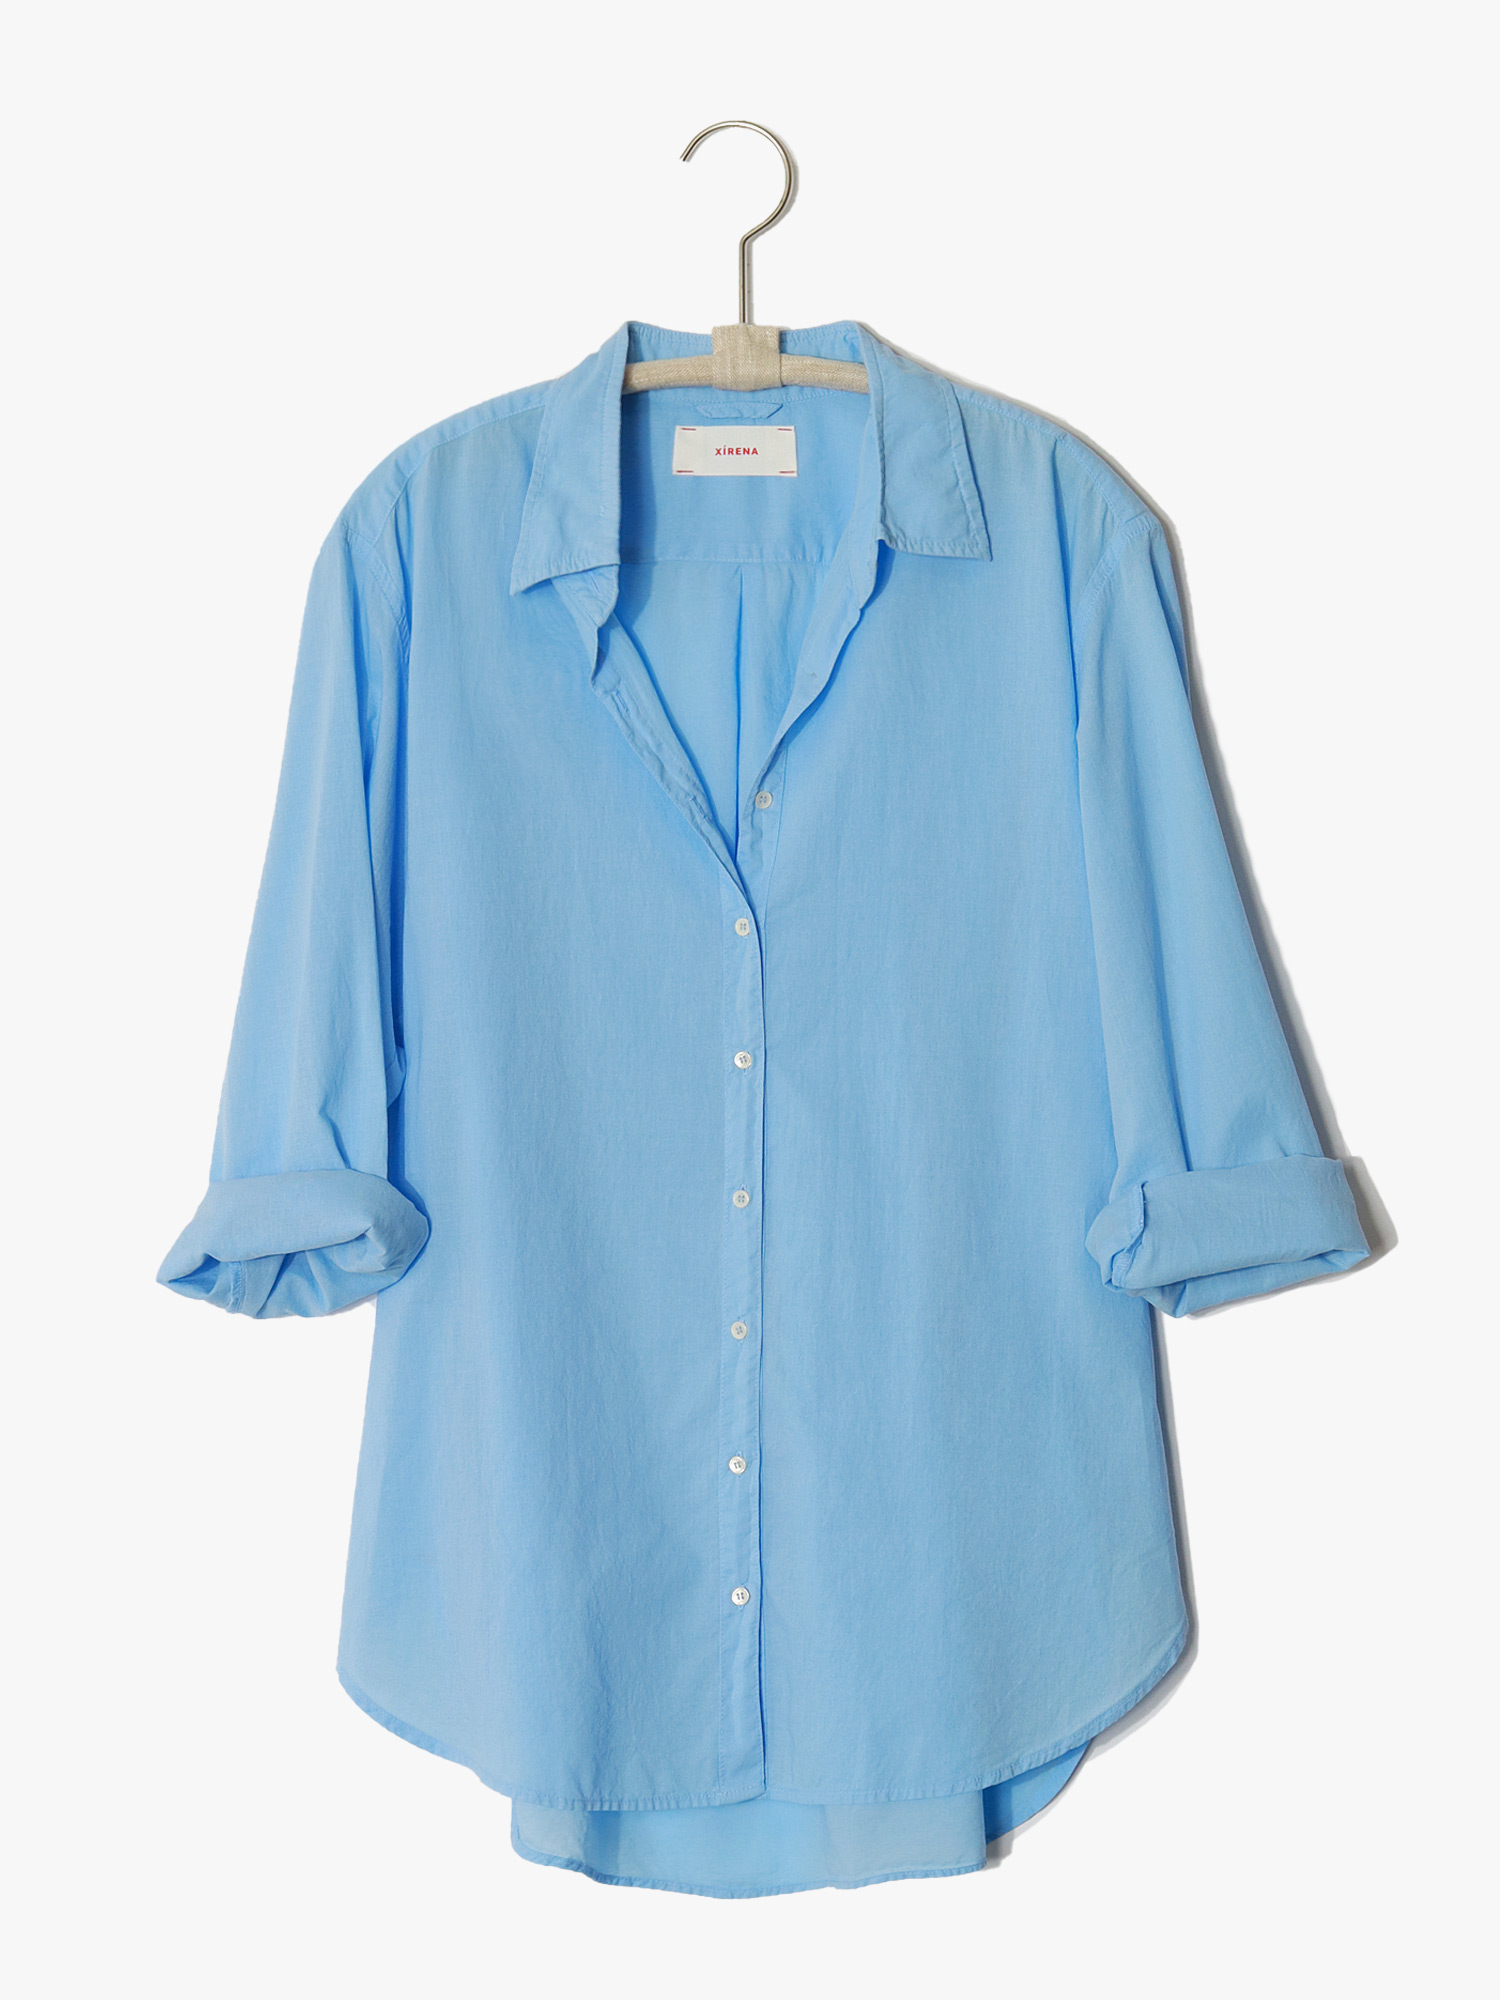 Xirena, Beau Shirt, CruiseBlue